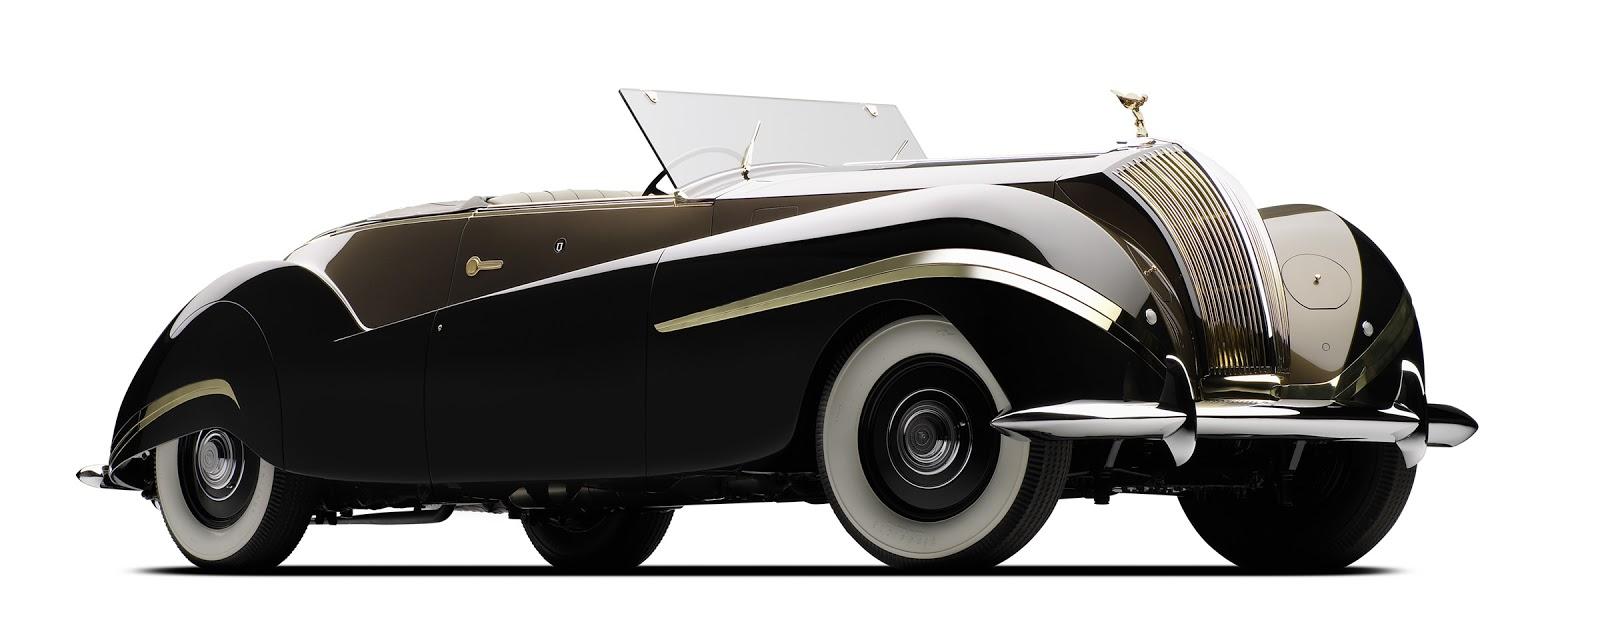 1939 Rolls-Royce Phantom III Cabriolet проектиран от Жан-Анри Лабурдет.